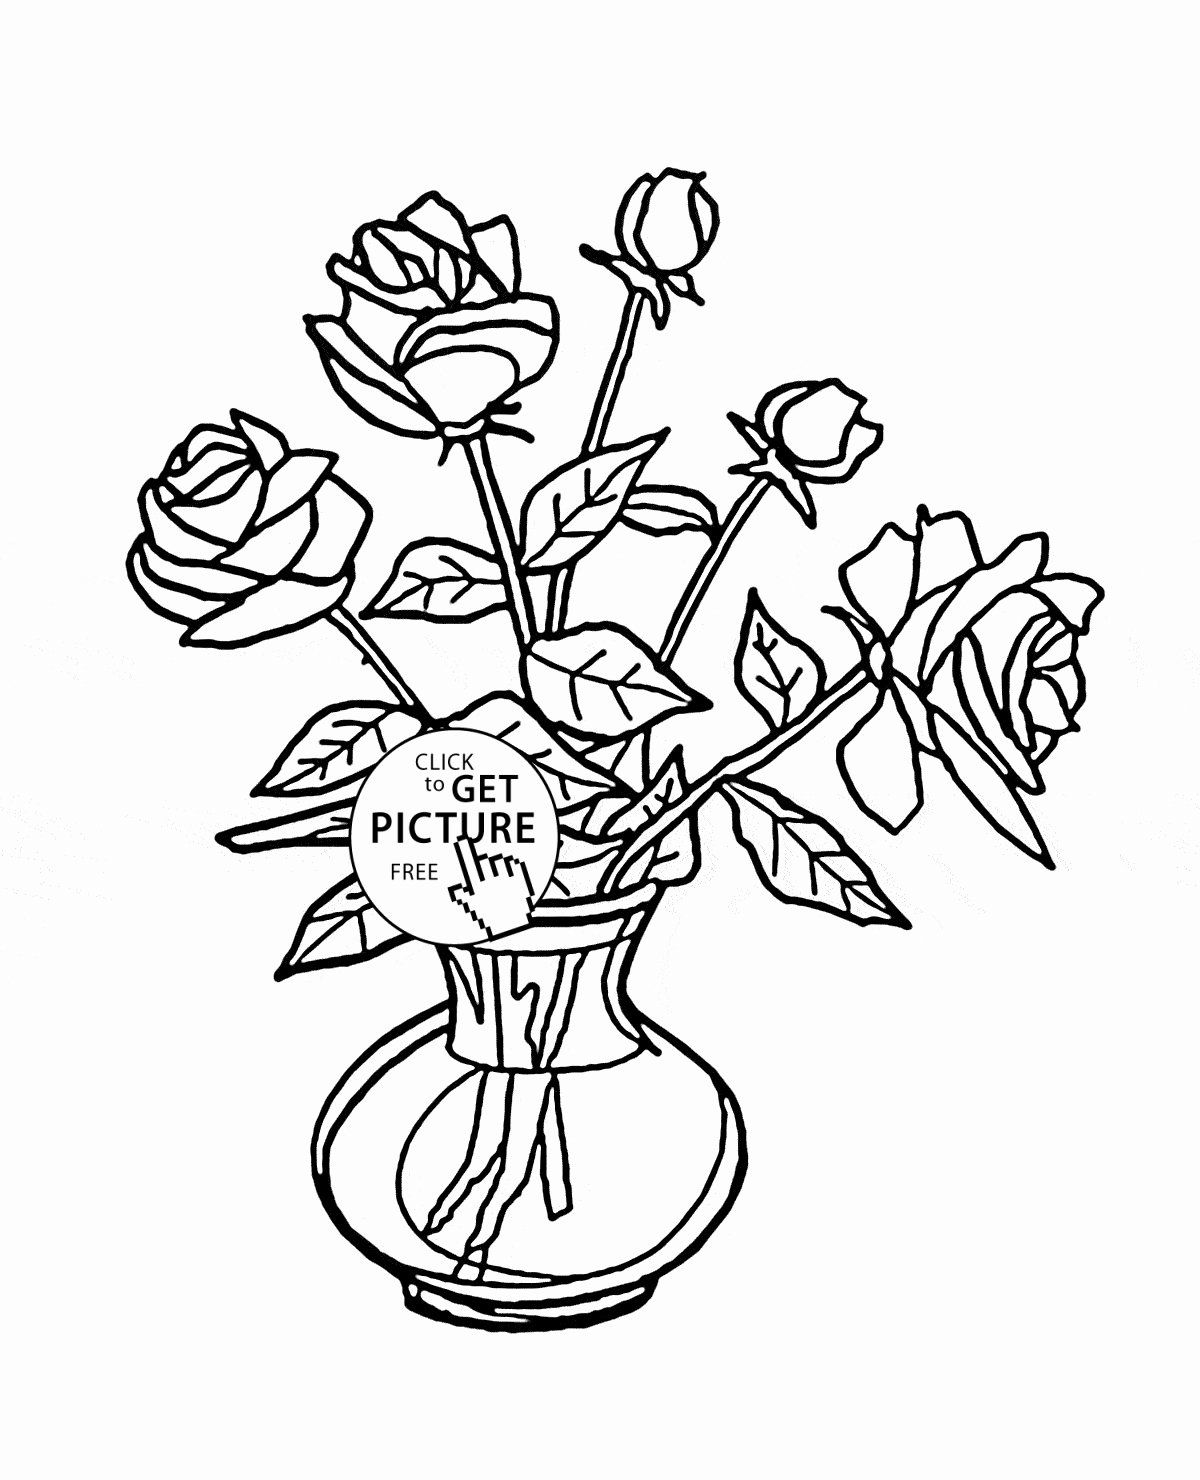 Free Printable Coloring Pages Flowers Unique Flowers In A Vase Coloring Page Flowers Healthy